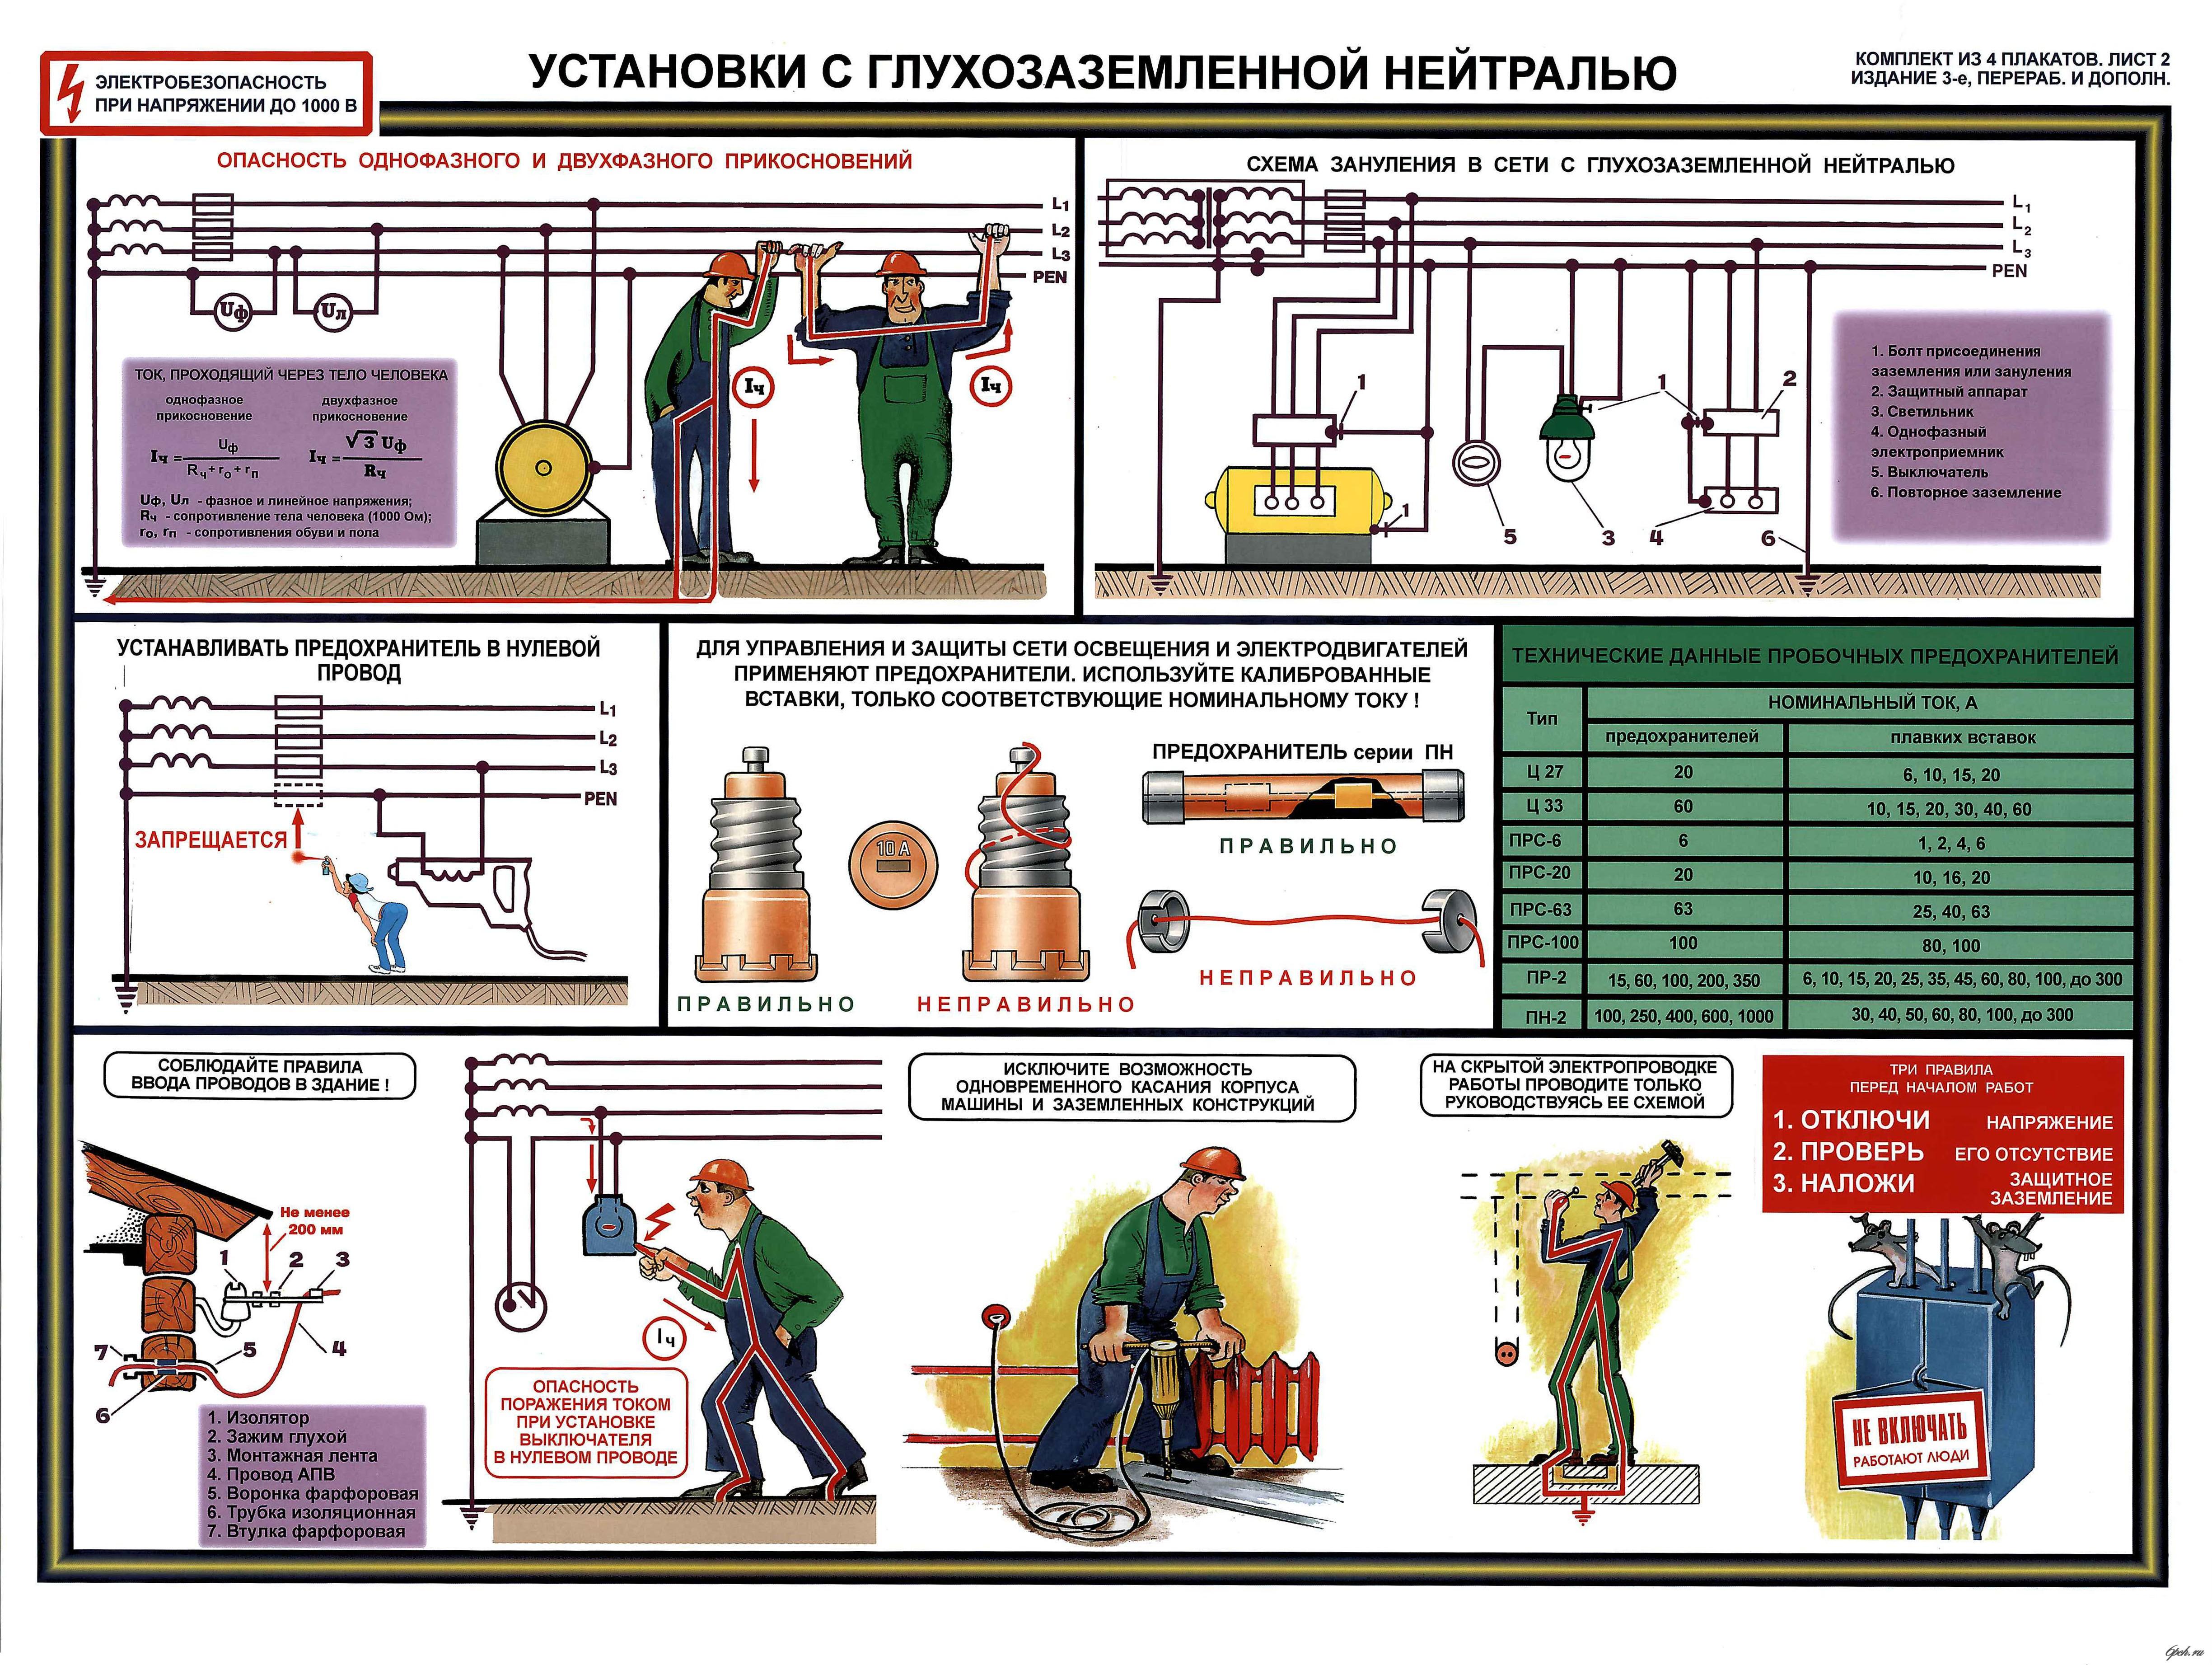 Техника безопасности на электробезопасности электробезопасность в вопросах и ответах для локомотивных бригад